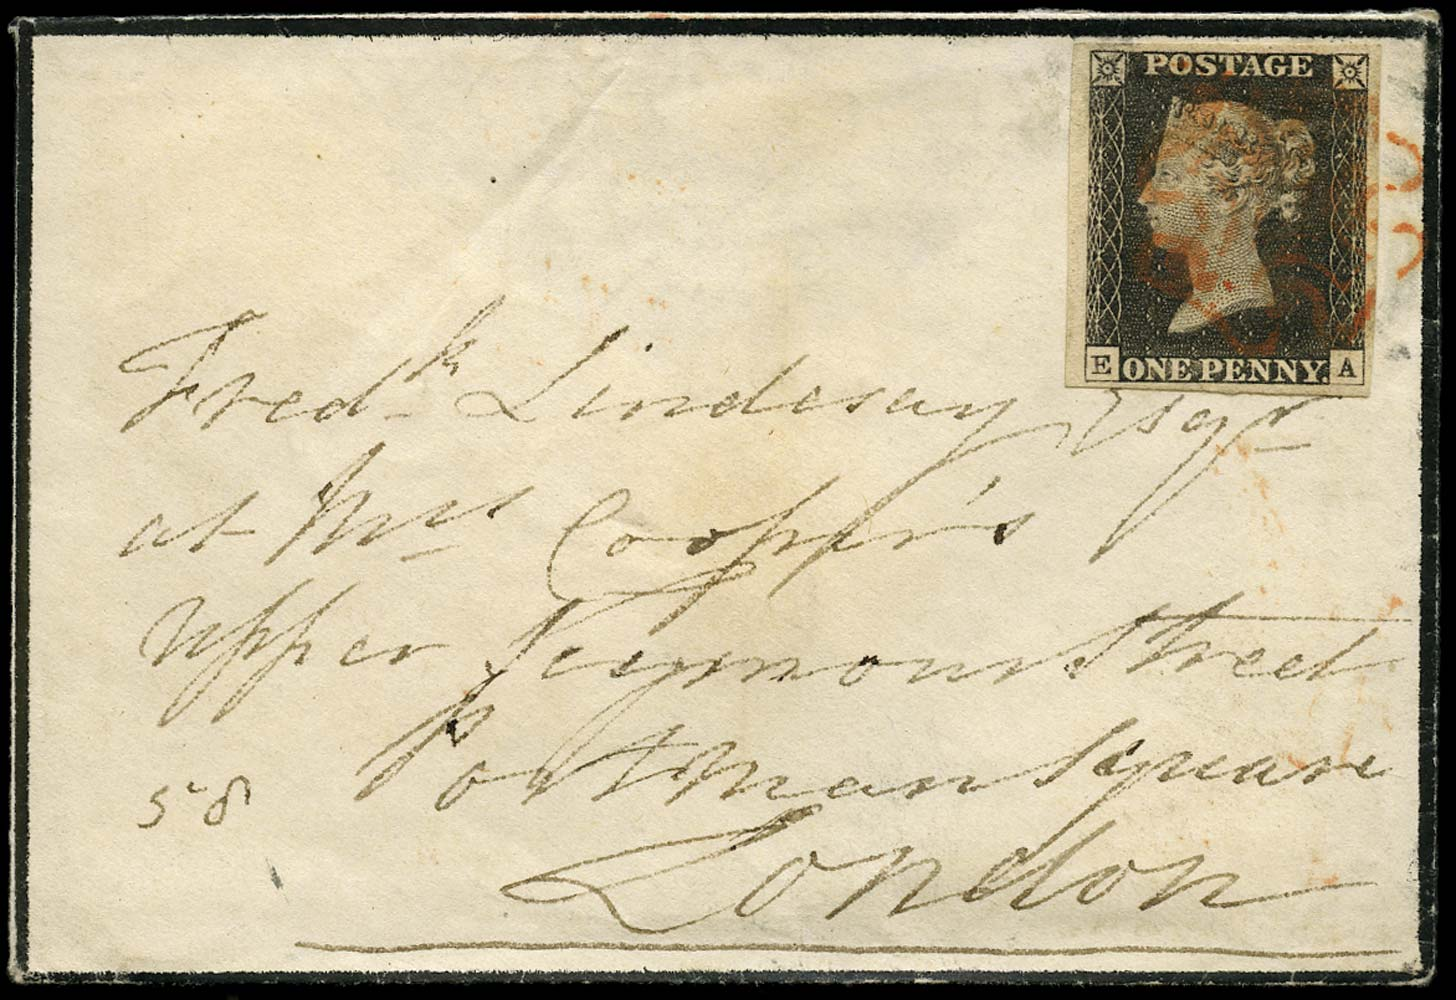 GB 1840  SG2 Pl.3 Penny Black envelope Tonbridge Wells to London